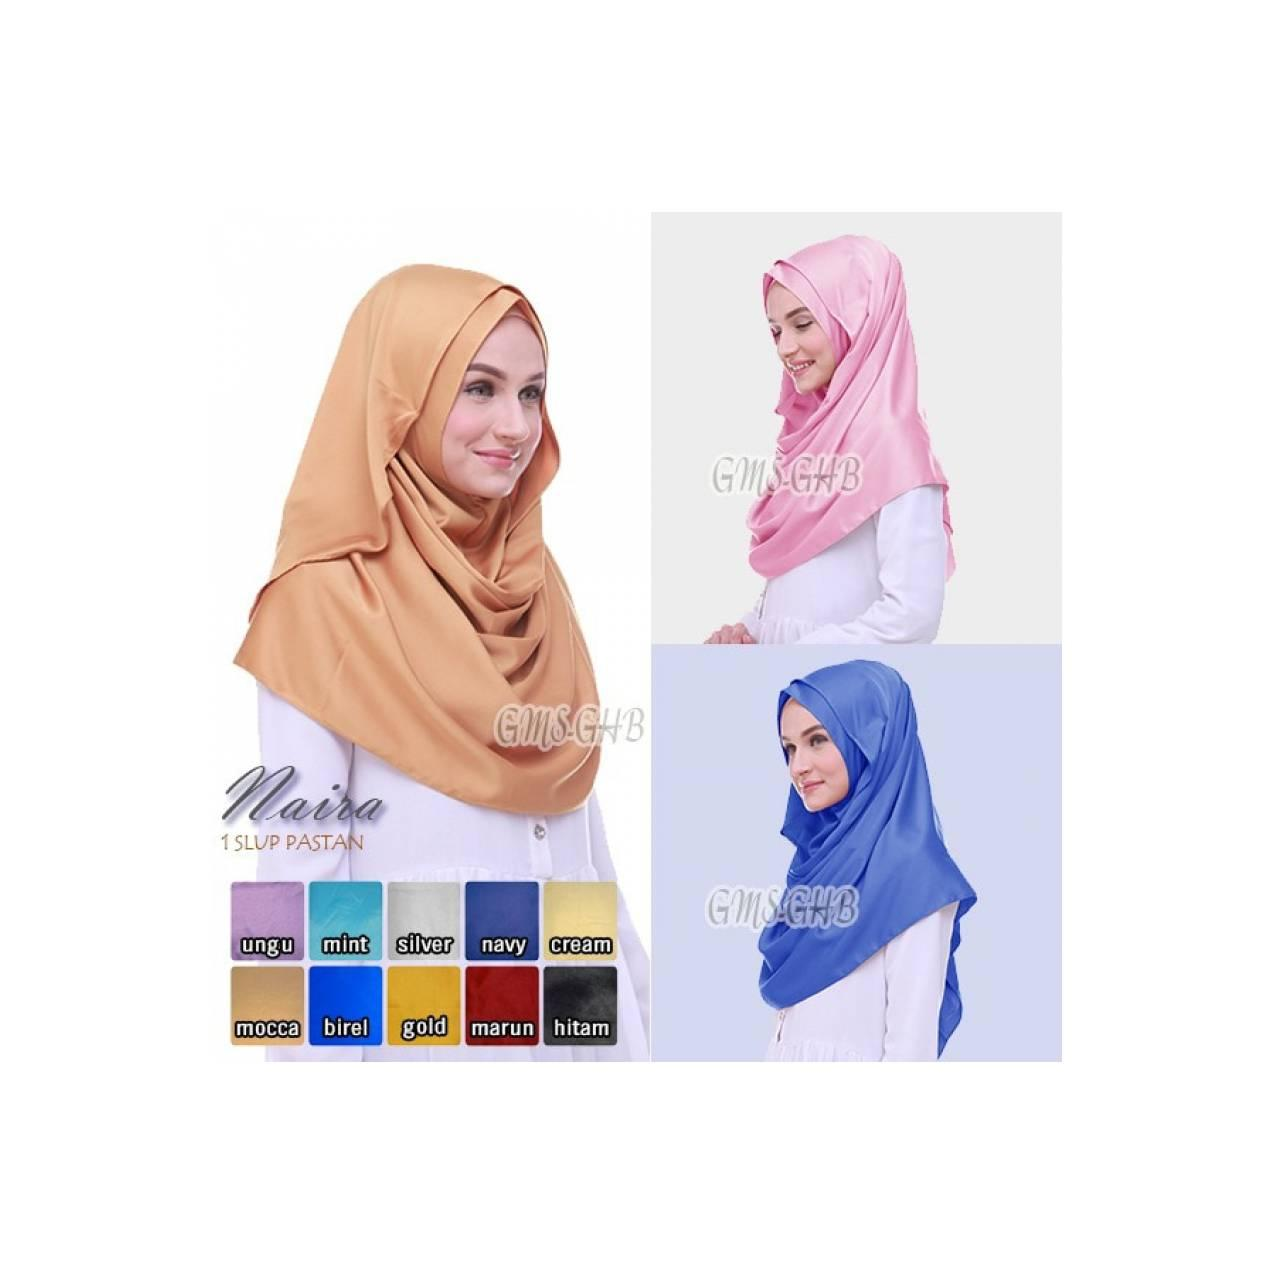 Jilbab Rabbani Hijab Syar i 1Slup Pastan Naira HJ87